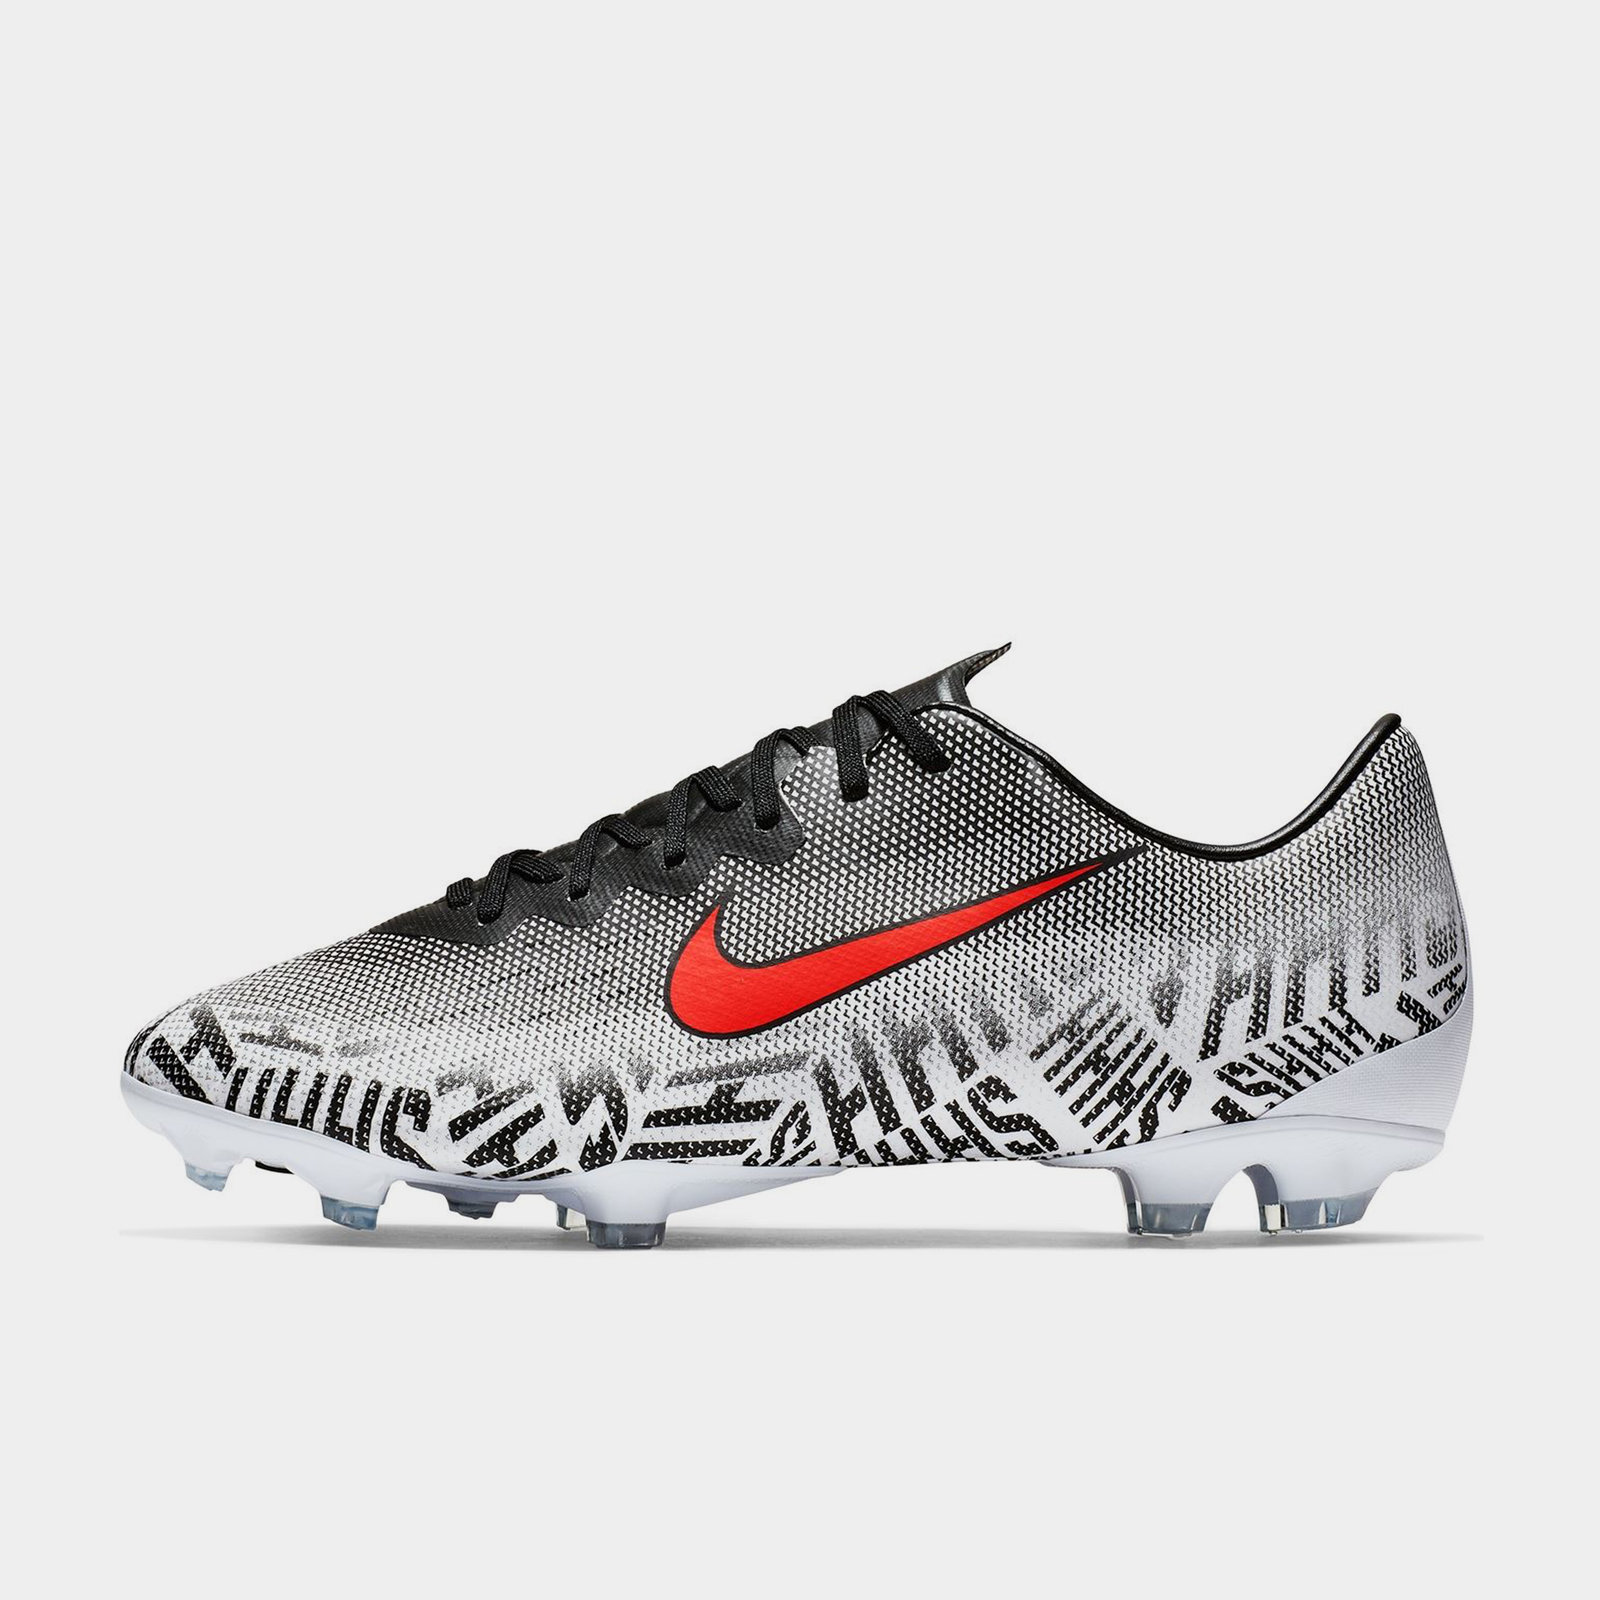 Vapor 12 Elite Njr FG Football Boots